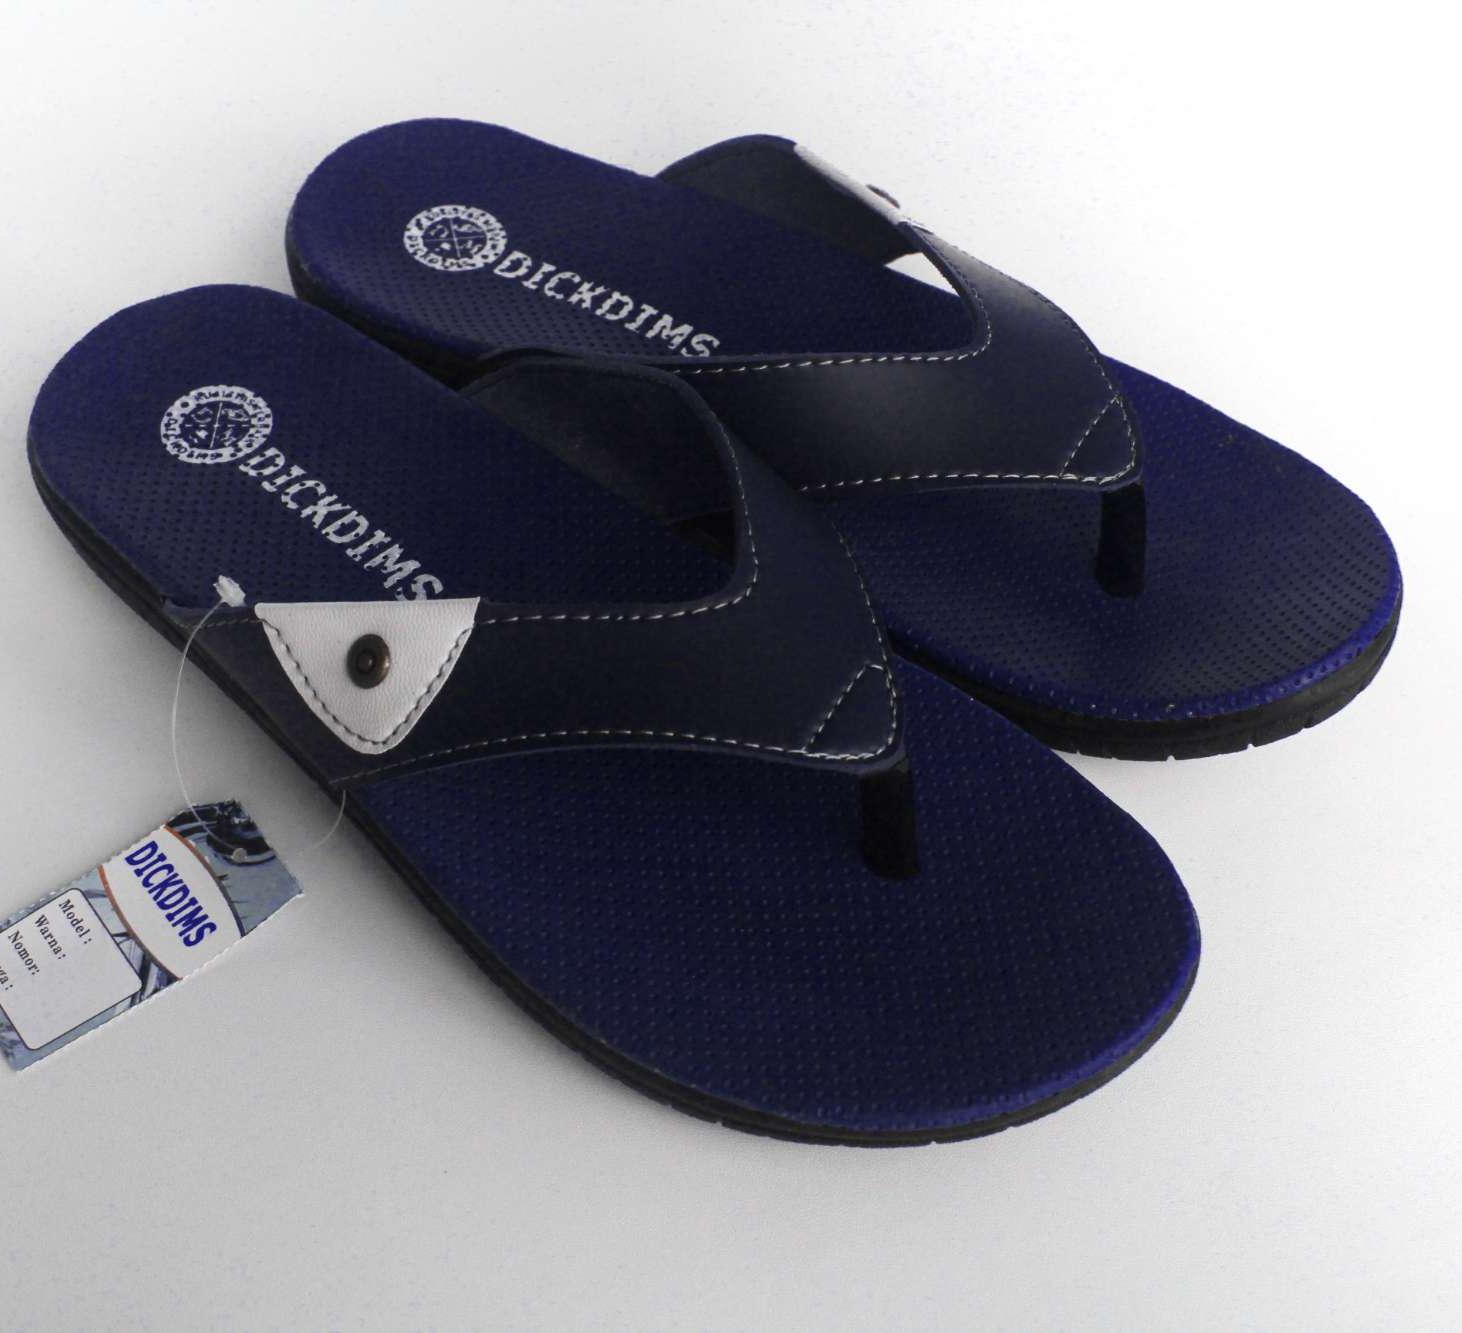 Sandal jepit Dickdims D05 Sandal japit